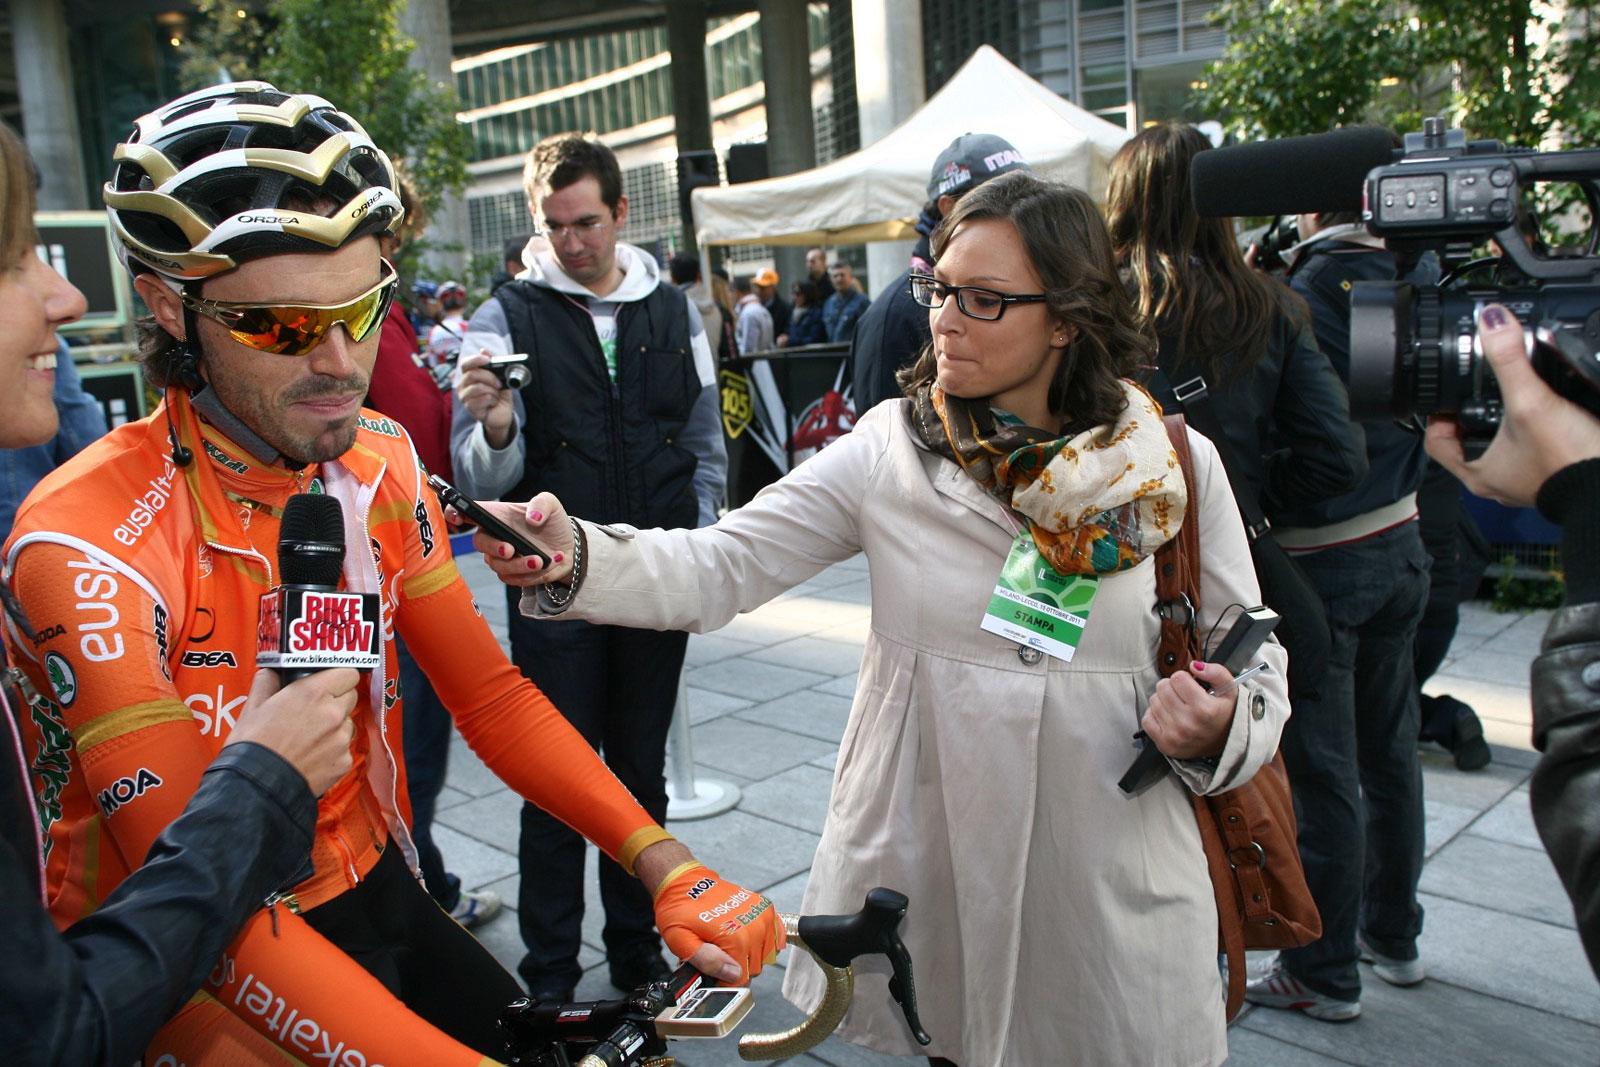 Giulia De Maio Samuel Sanchez Lombardia ciclismo